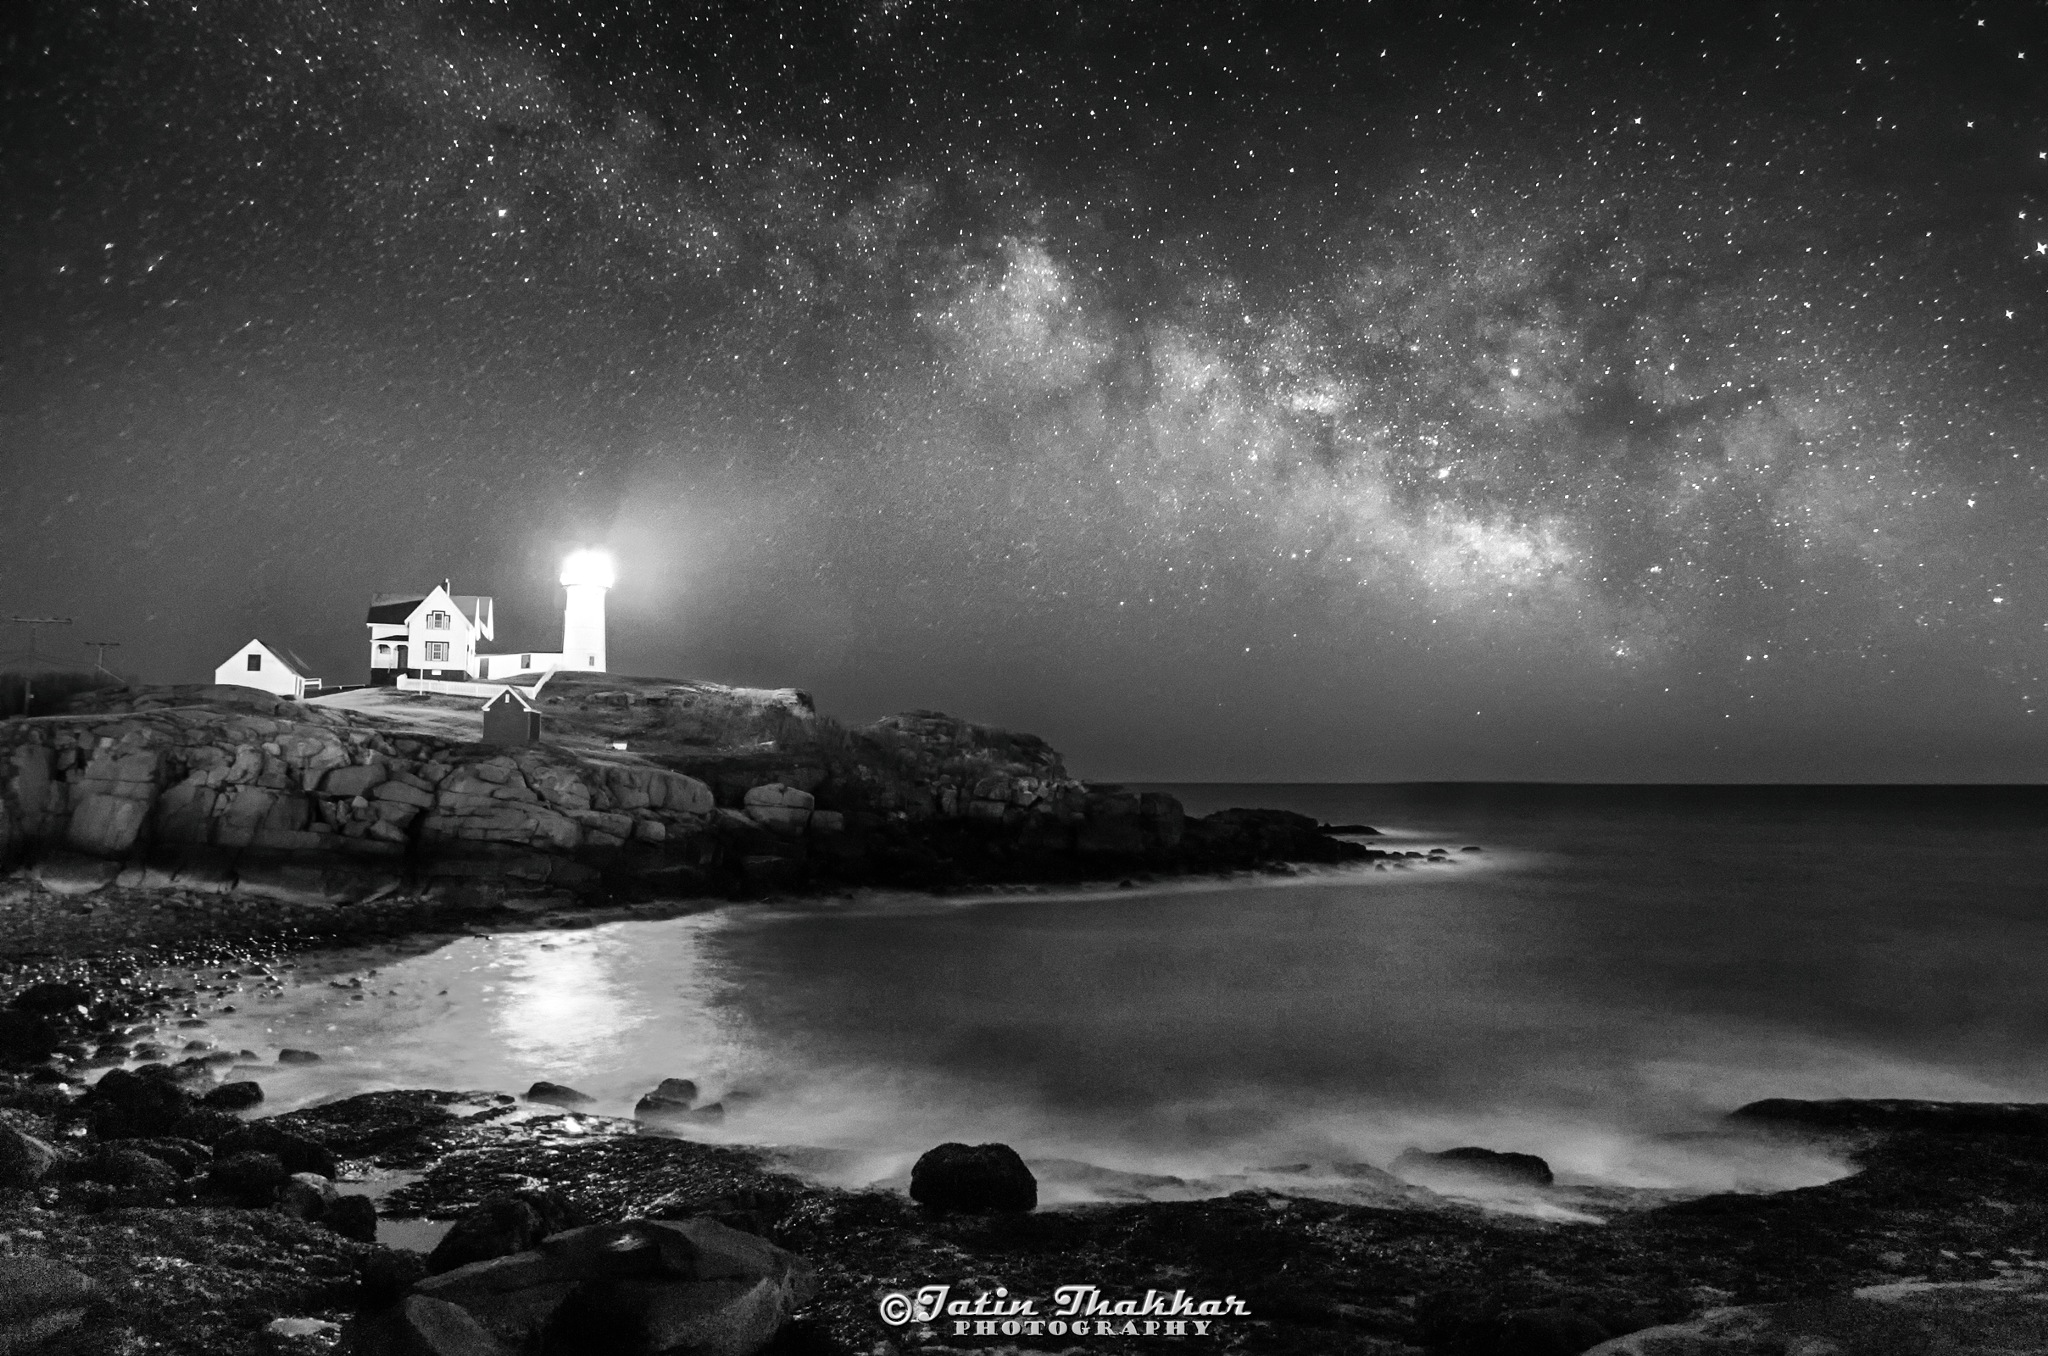 Nubble at Night by Jatinkumar Thakkar